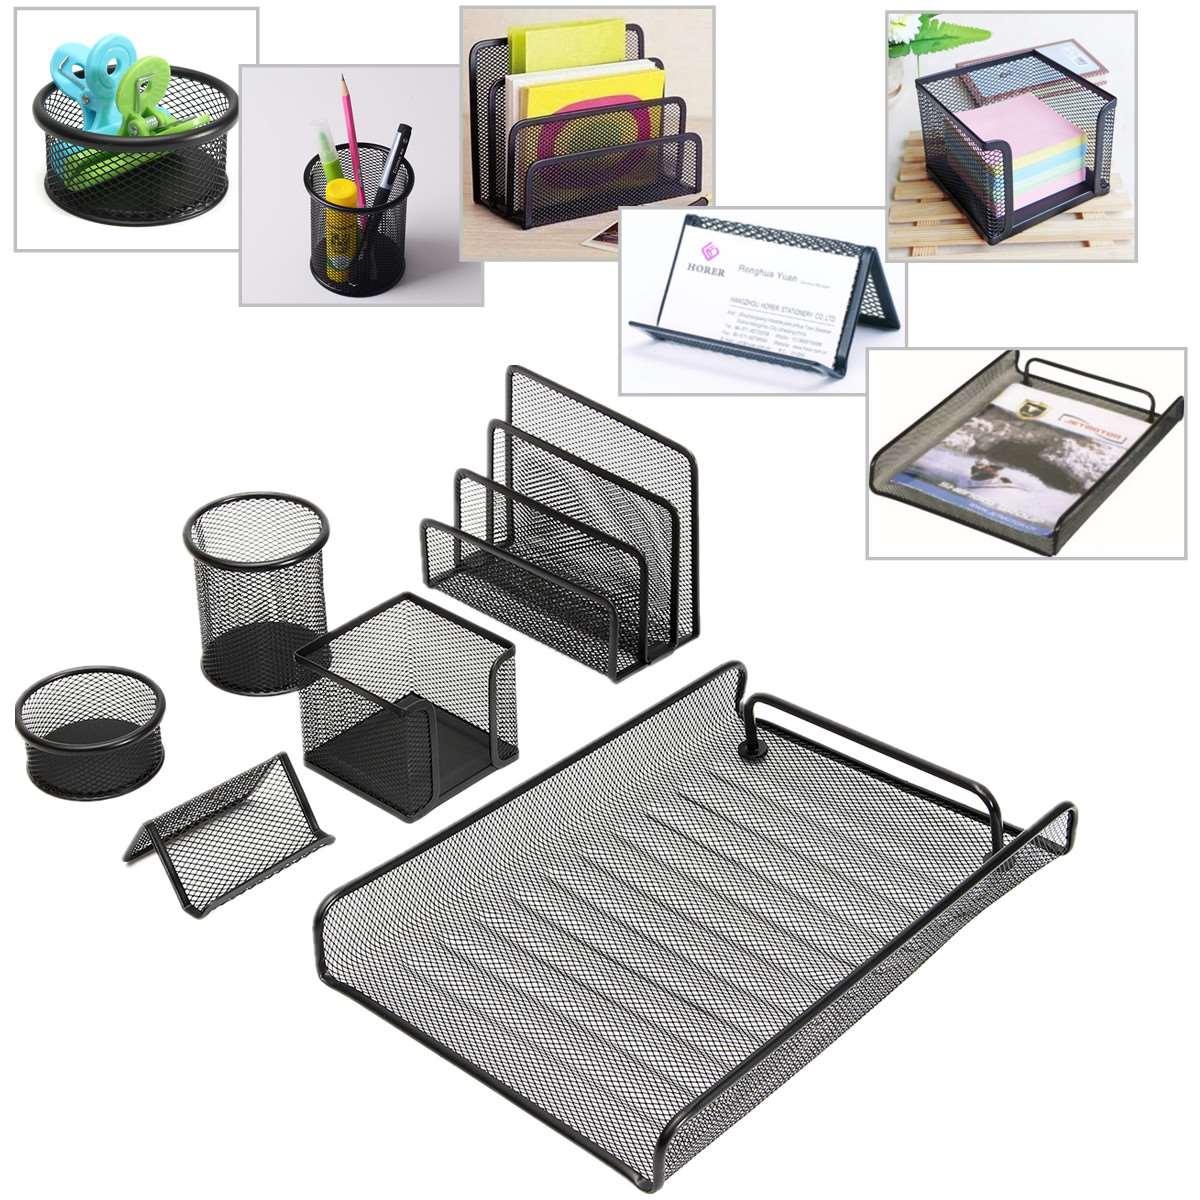 6Pcs/Set Metal Pen Desktop Storage Holder Multifunctional Mesh Pencils Desk Organizer Box Slots Home Office Stationery(China (Mainland))